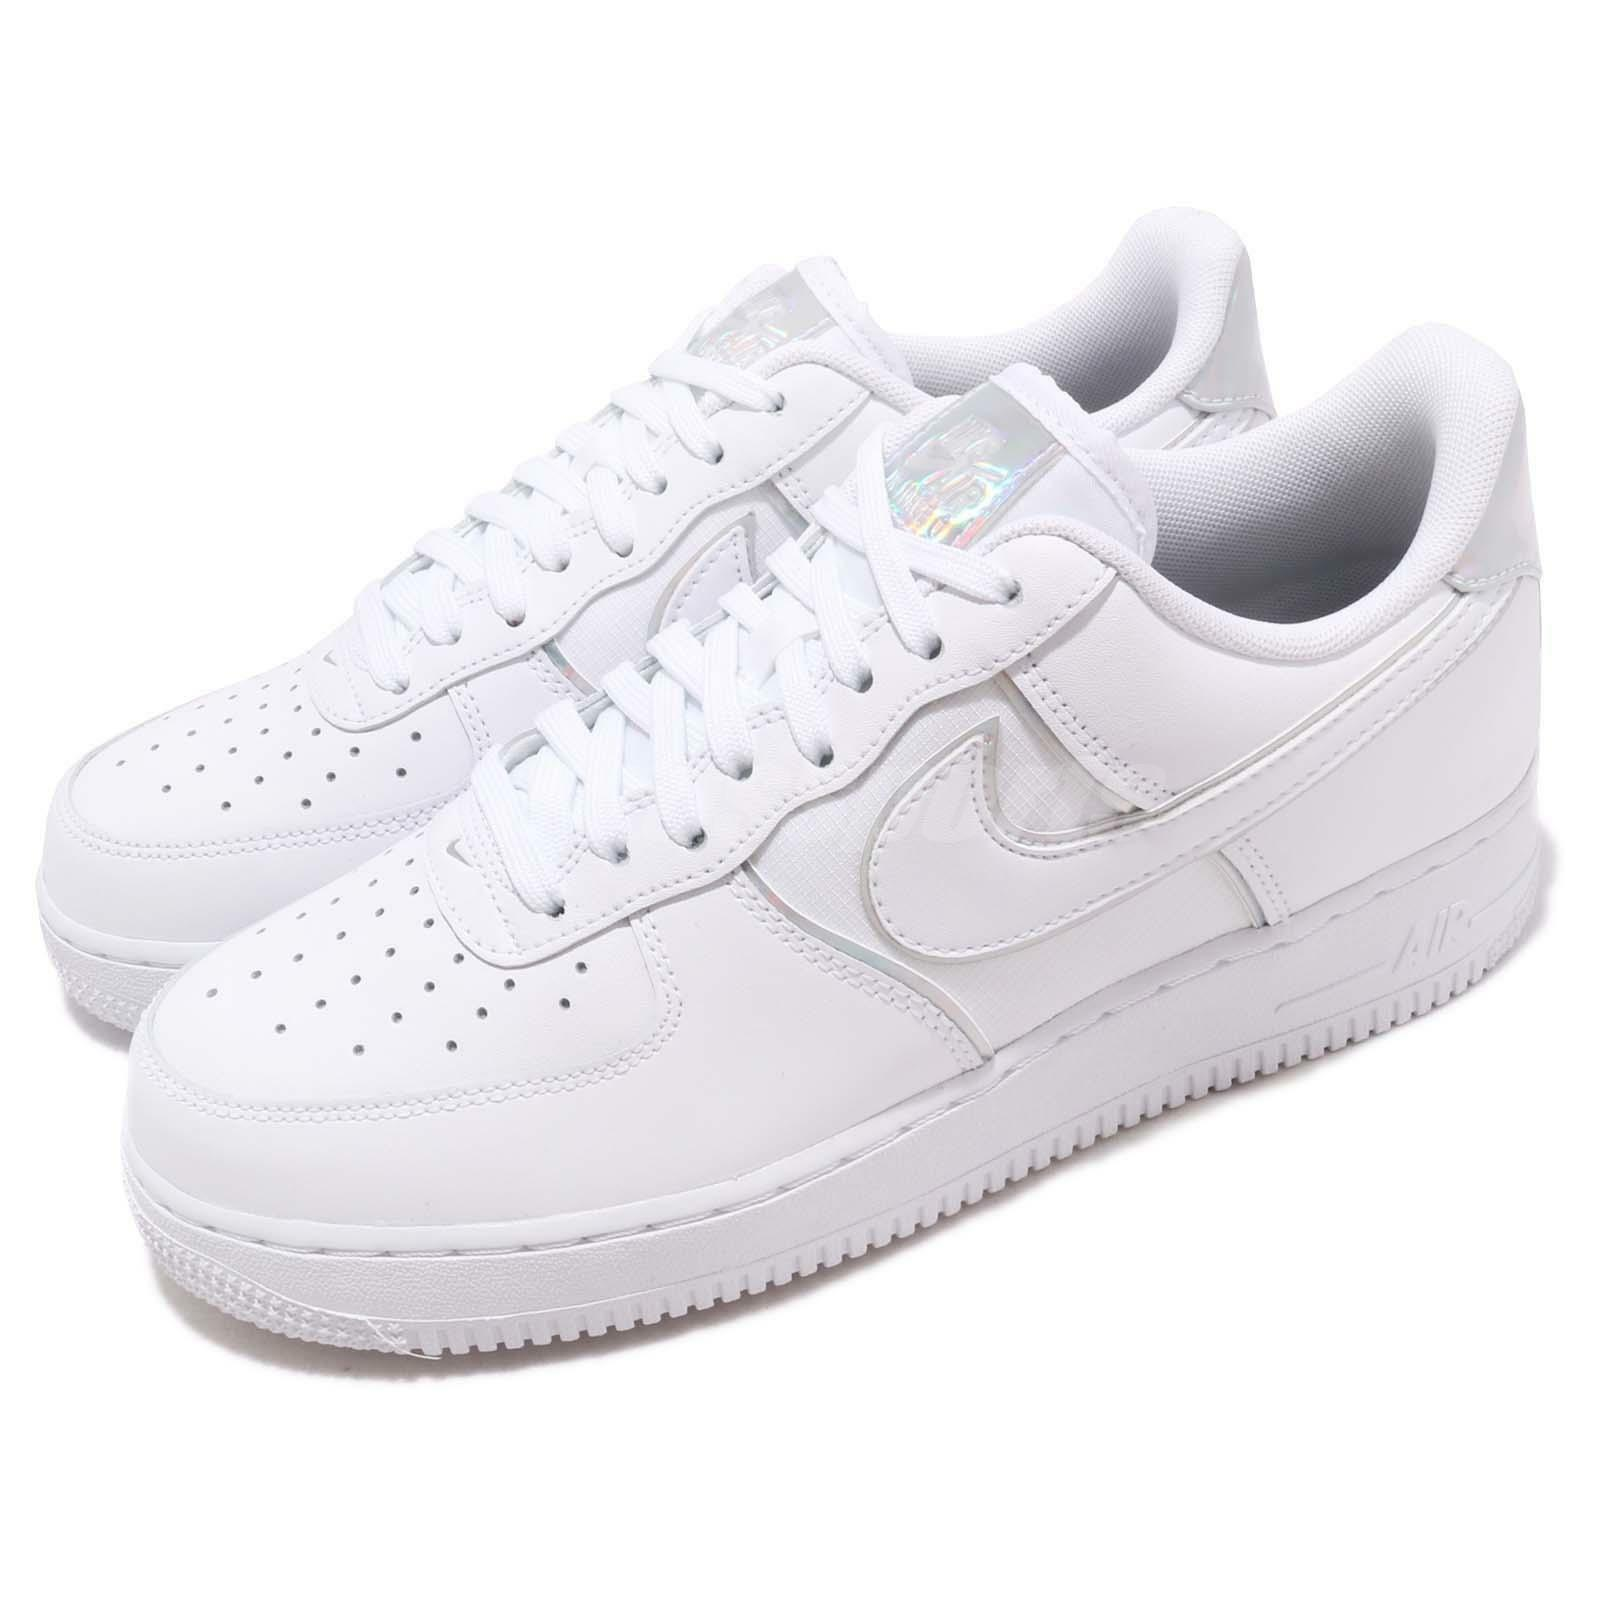 Nike Nike Nike Air Force 1 07 LV8 4 bianca Iridescent Men Casual scarpe scarpe da ginnastica AT6147-100 | Outlet Store  c612b8